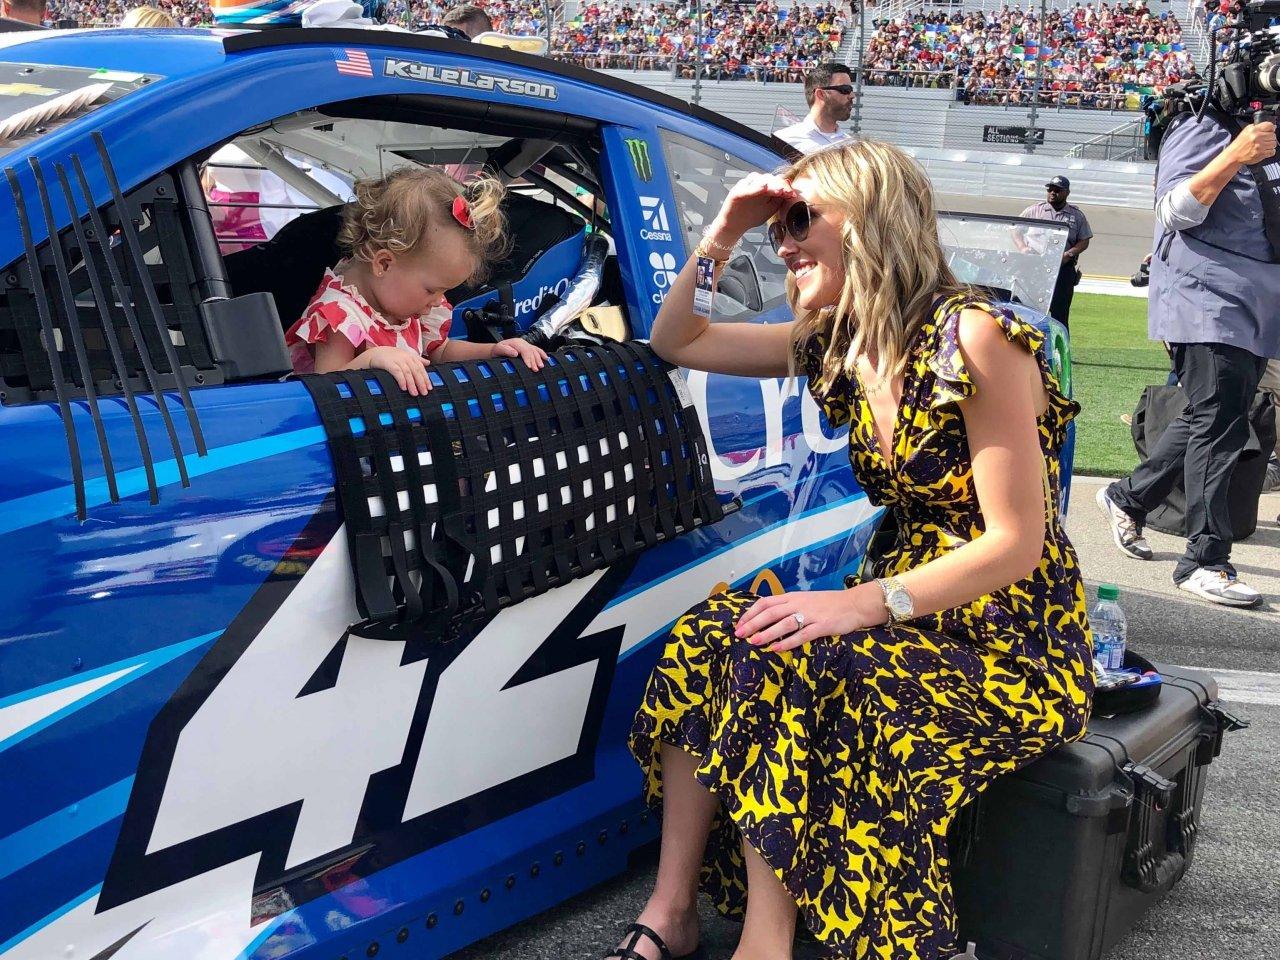 NASCAR driver Kyle Larson, his wife Katelyn Larson and their daughter Audrey Layne Larson